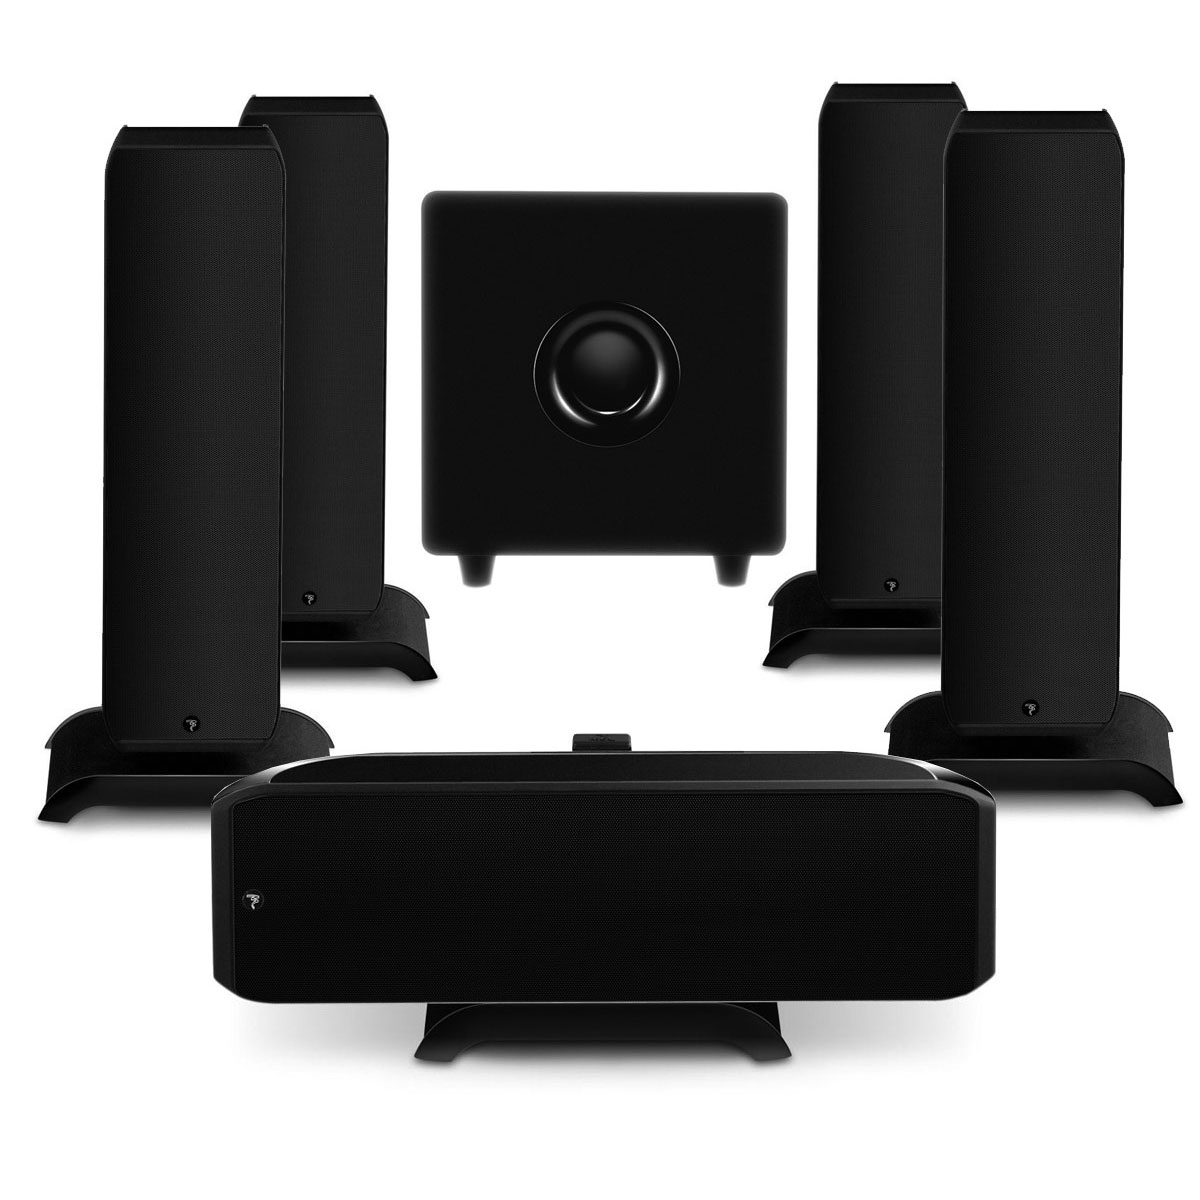 yamaha rx a730 noir focal sib xl 5 1 yamaha rxa 730. Black Bedroom Furniture Sets. Home Design Ideas